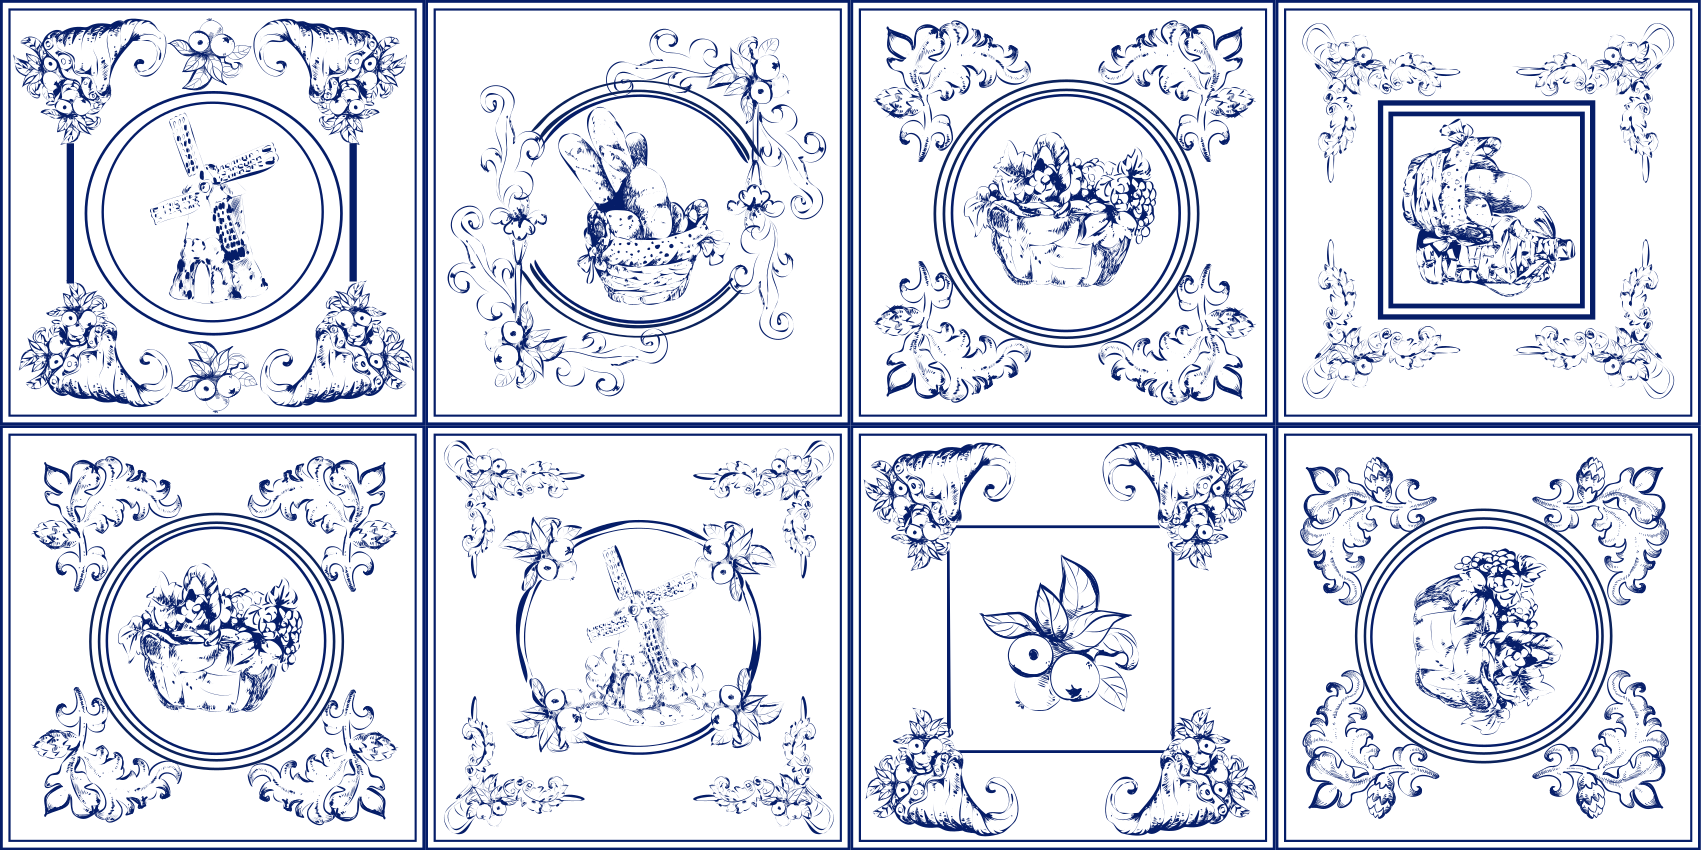 TenStickers. 复古蓝色瓷砖瓷砖垫. 老式乙烯基地板,您可以用白色背景的蓝色瓷砖设计来装饰您想要翻新的任何空间,完美呈现复古风格